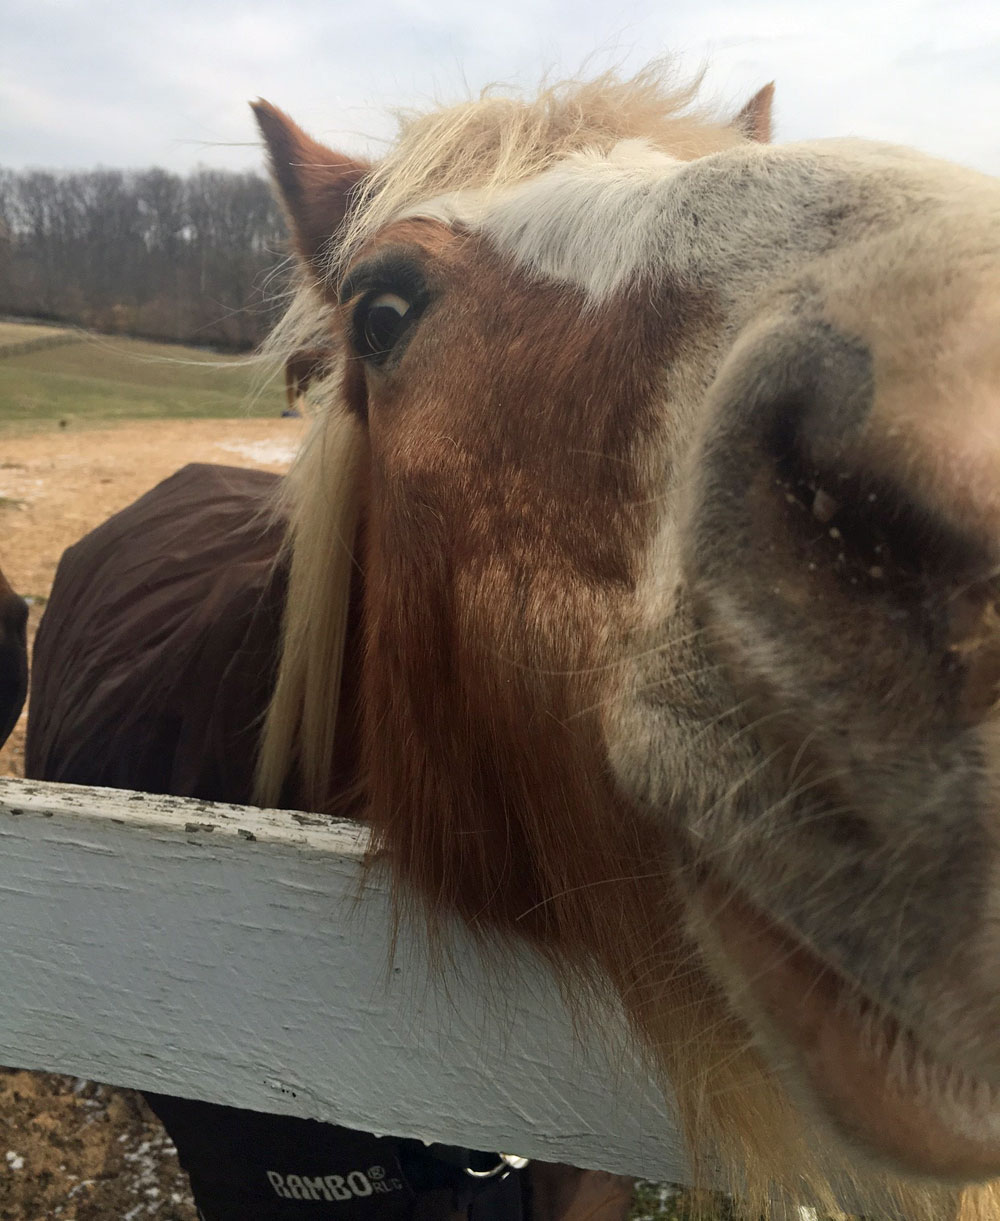 Horse nose up close